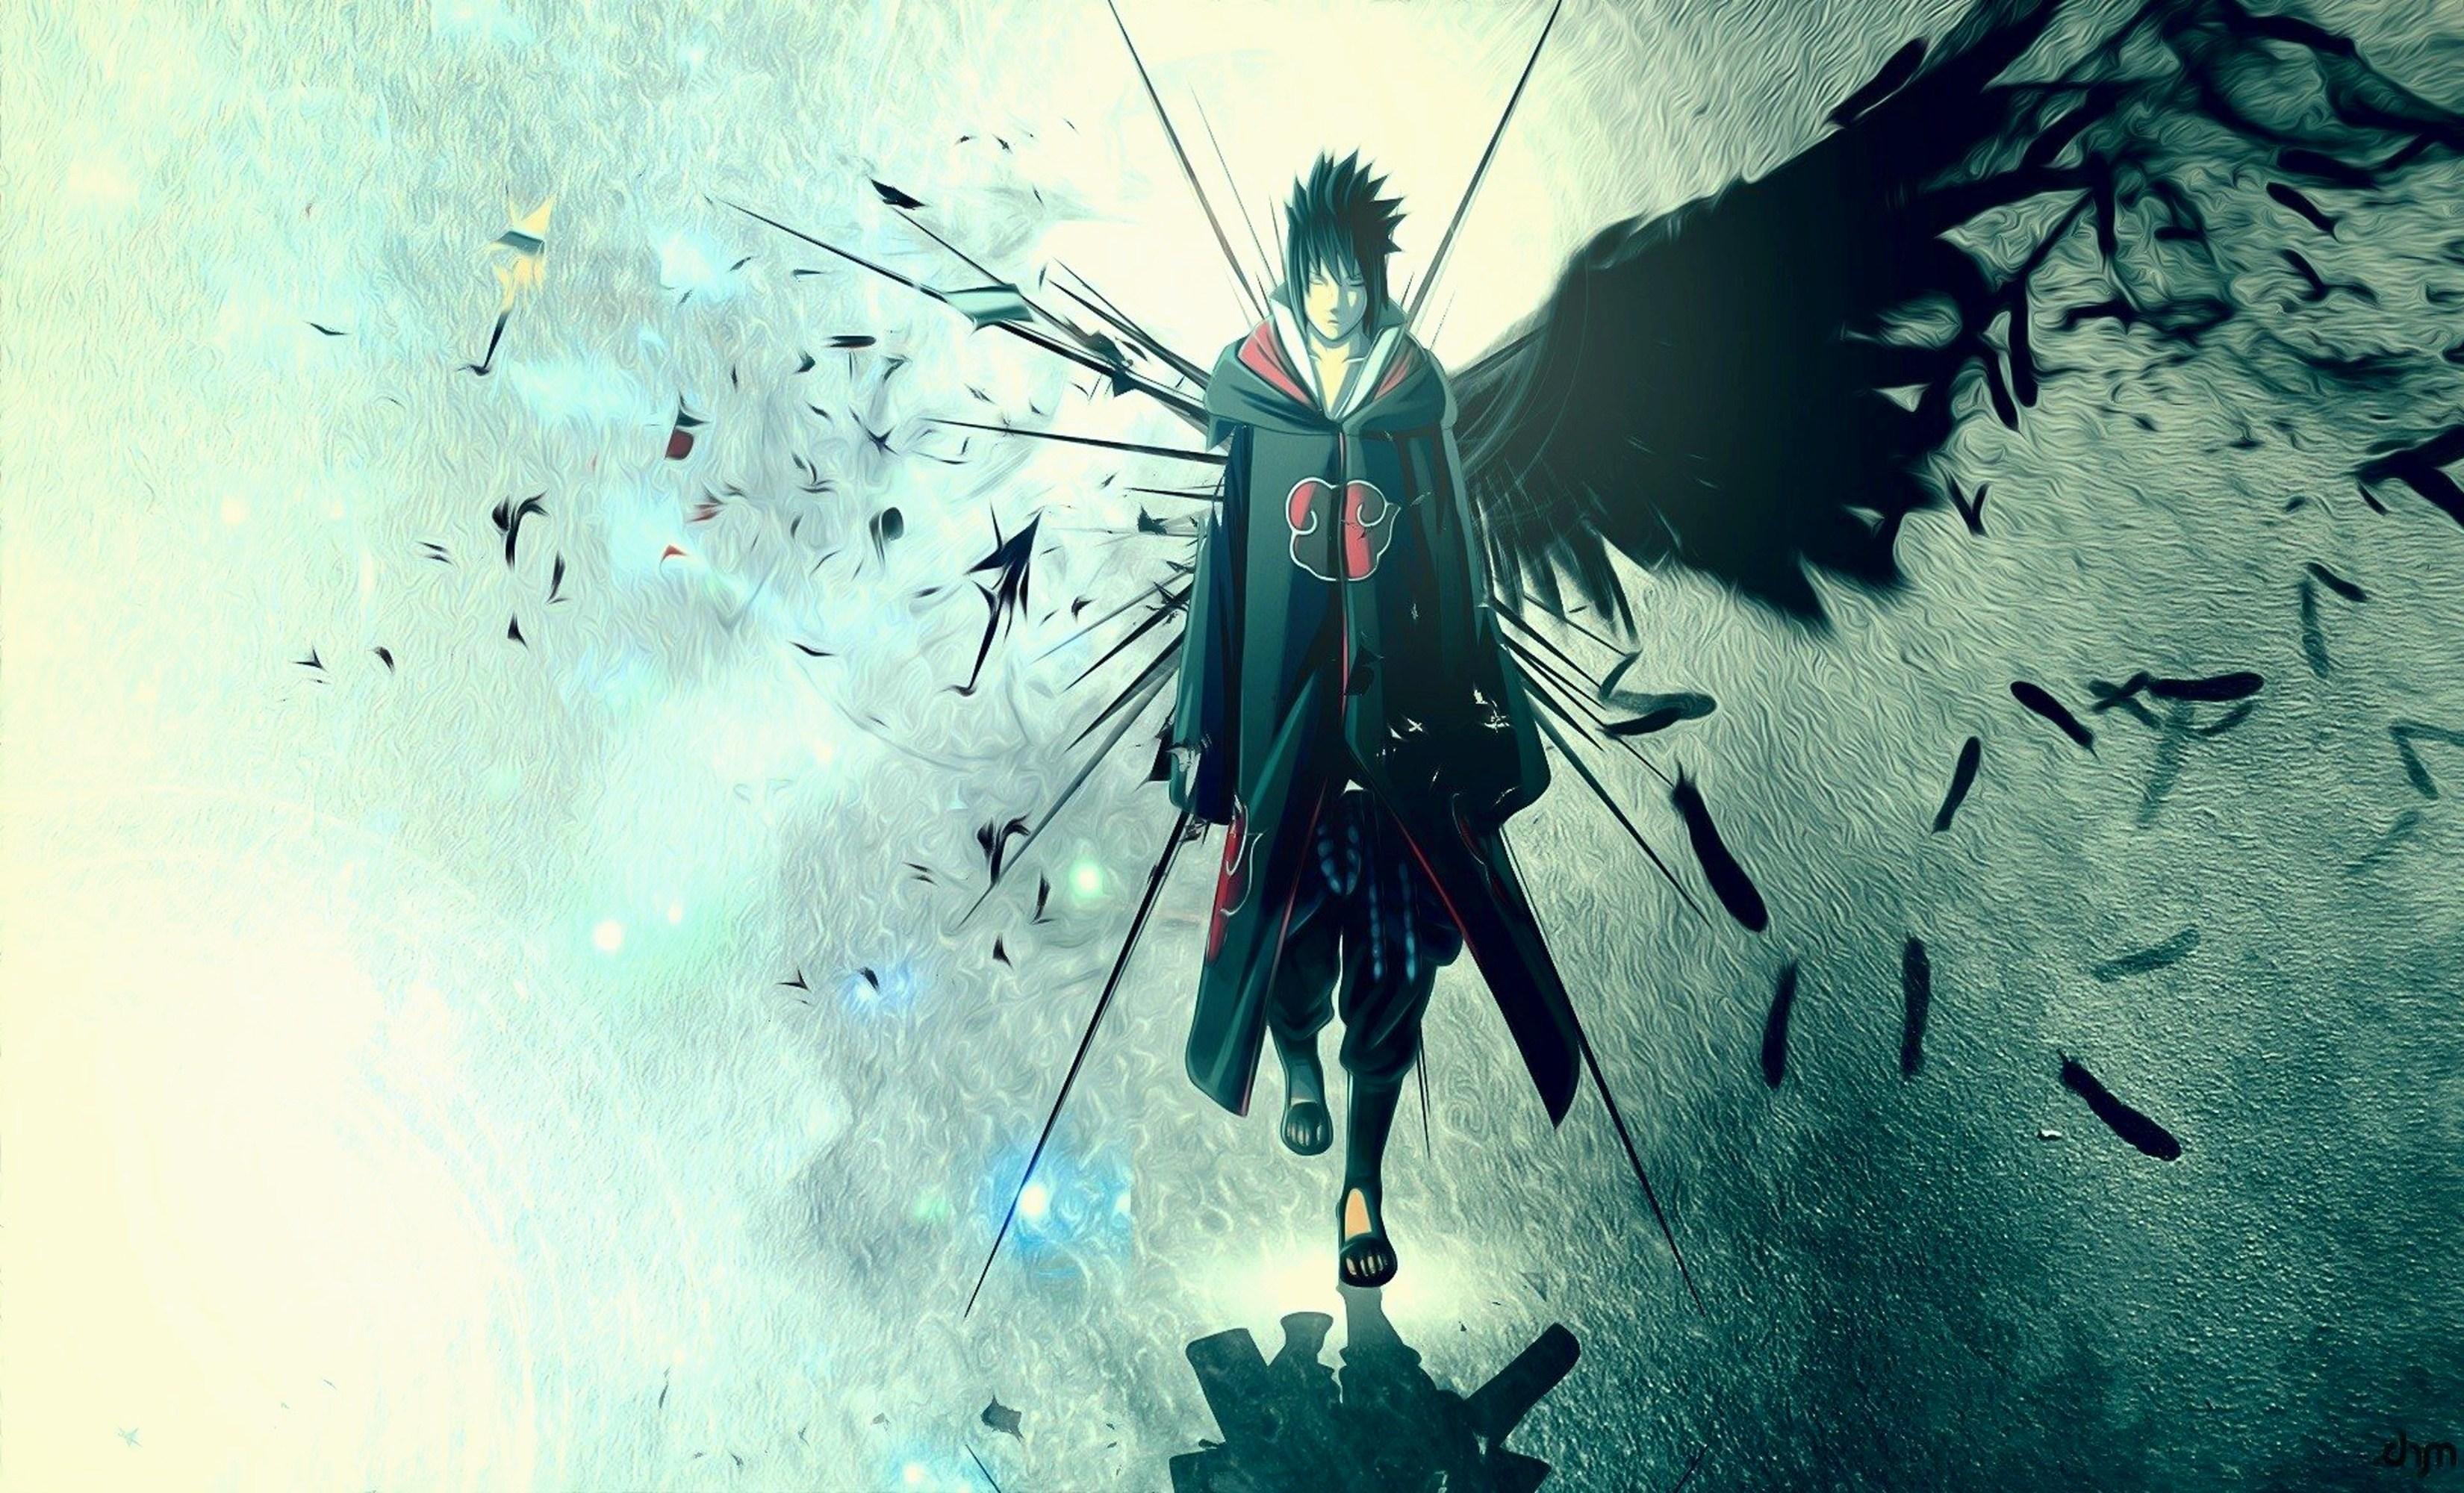 Download Best Anime Wallpaper HD Backgrounds Download Itlt